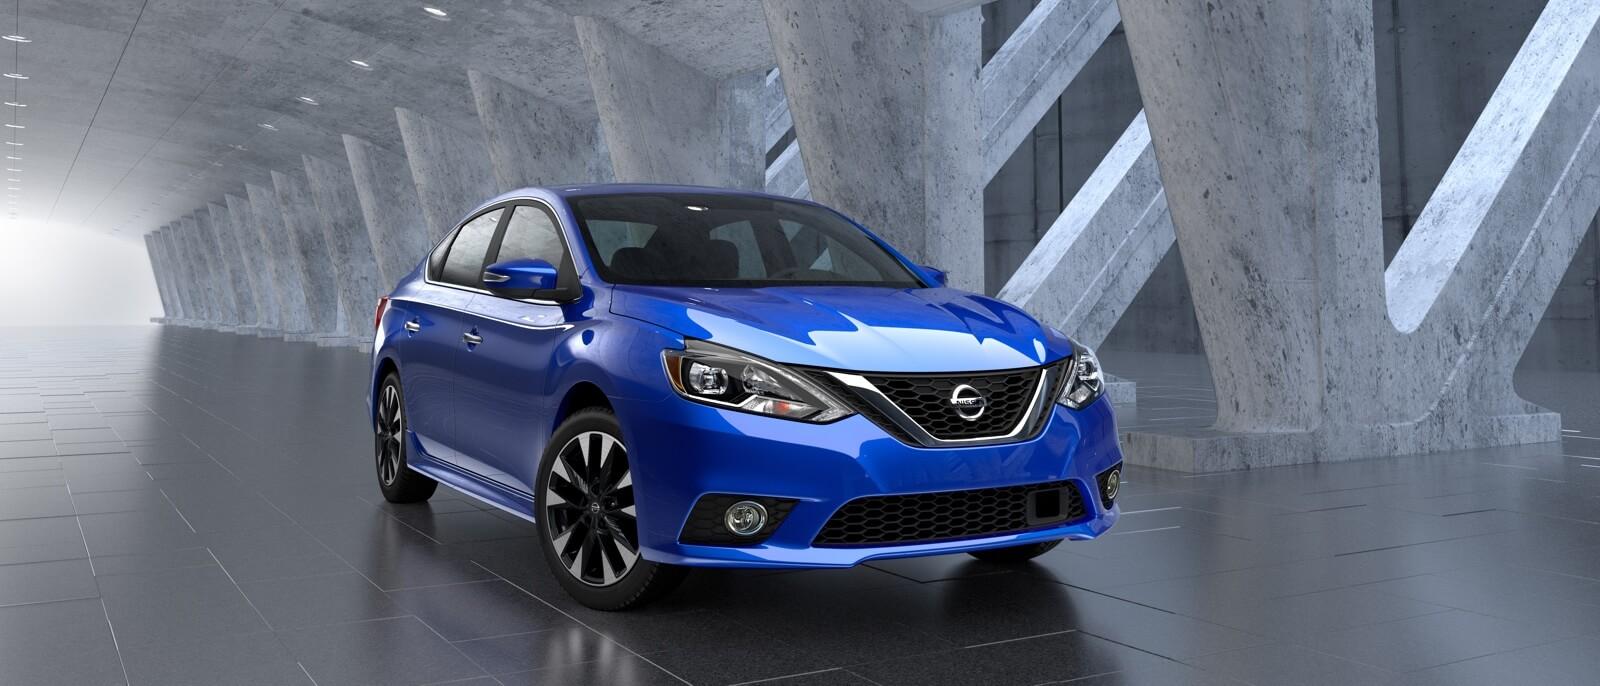 Blue 2016 Nissan Sentra on display